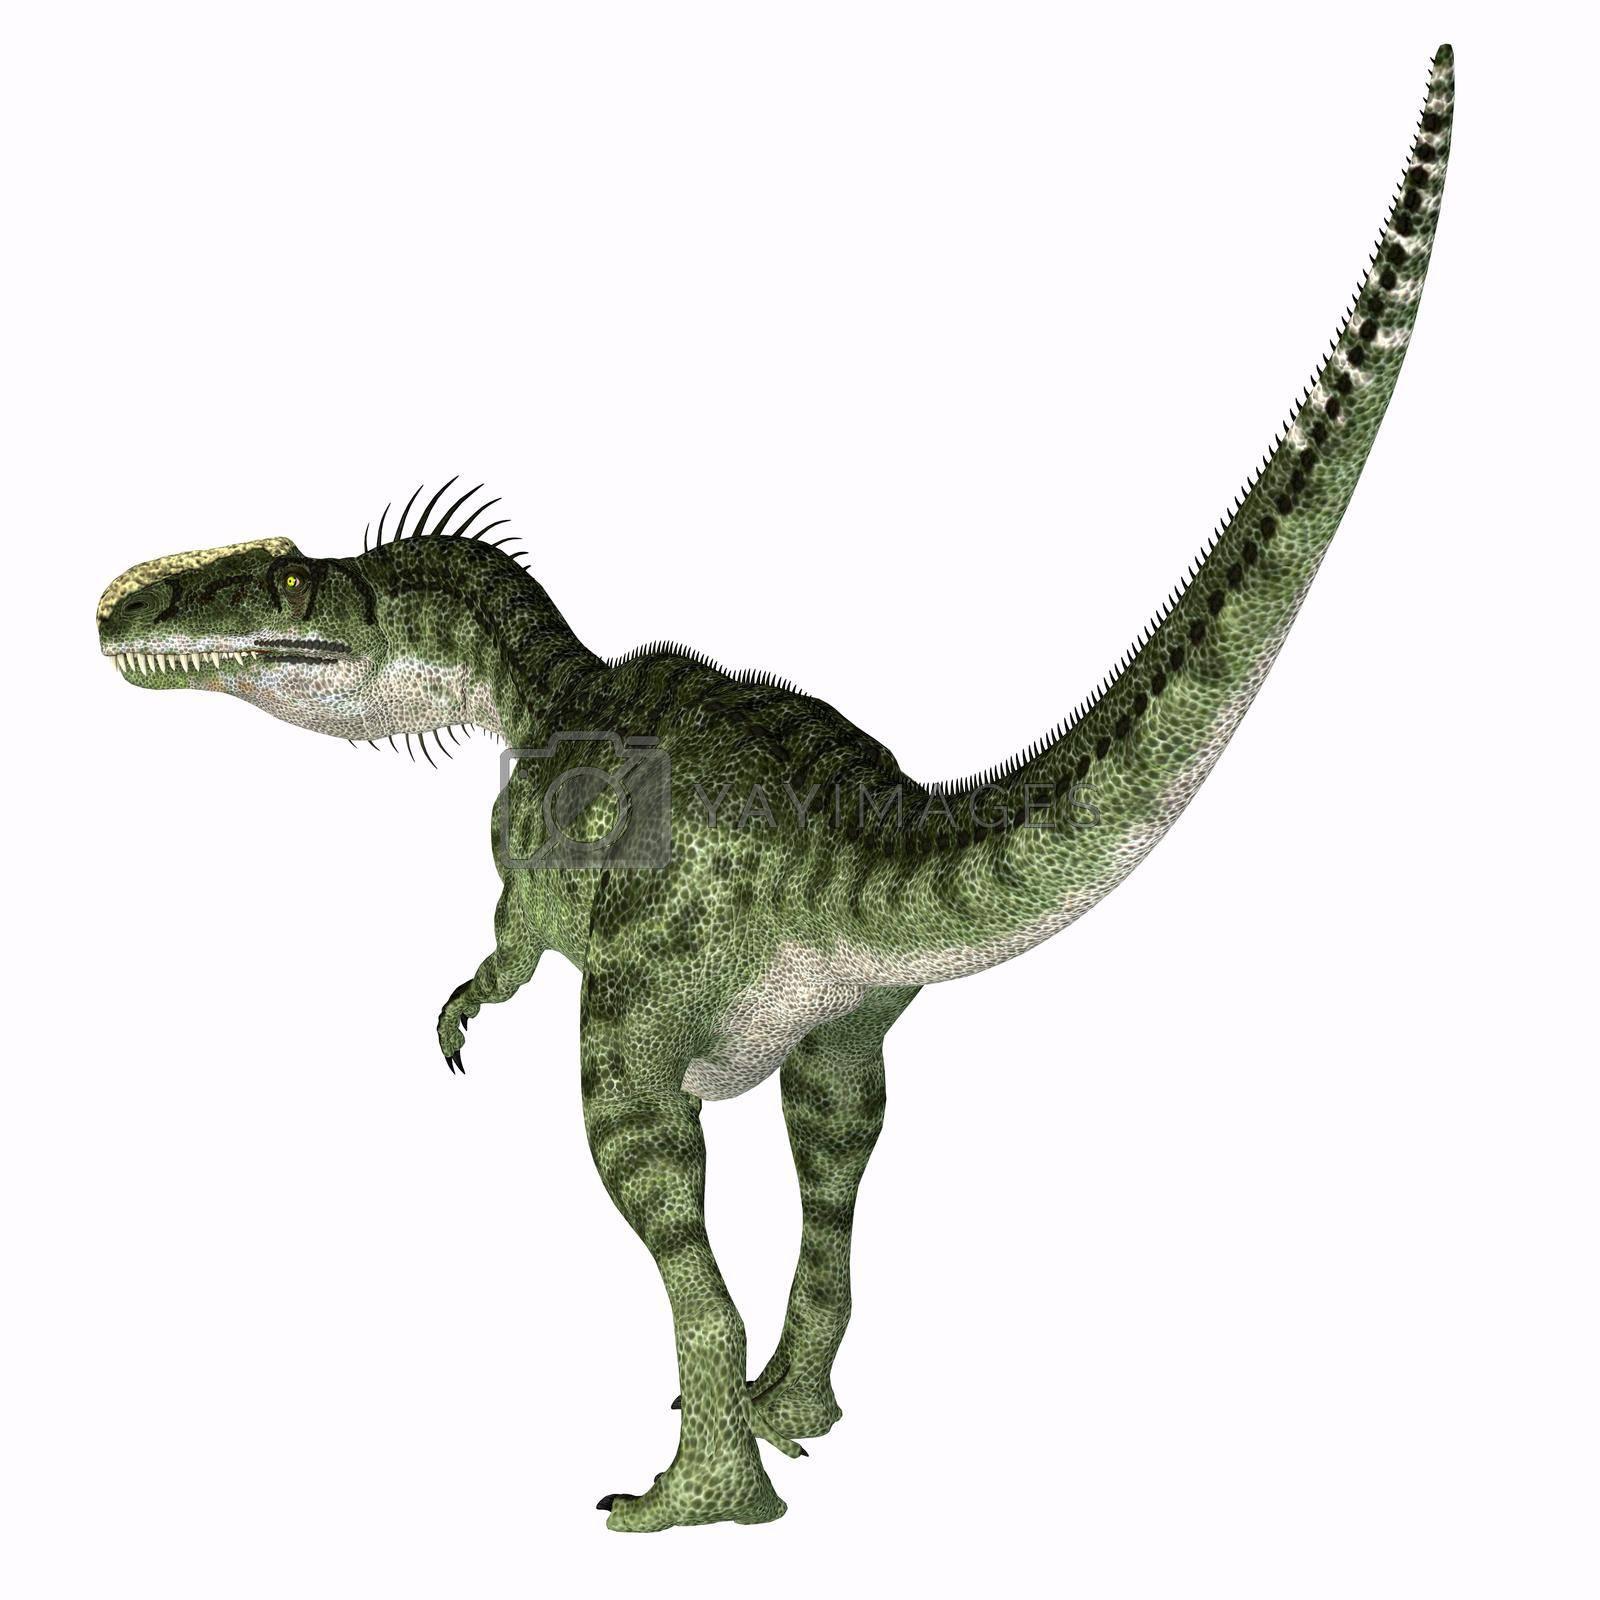 Royalty free image of Monolophosaurus Dinosaur Tail by Catmando